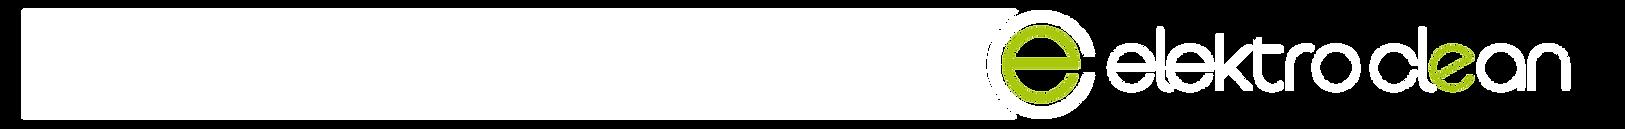 logo neu header.png